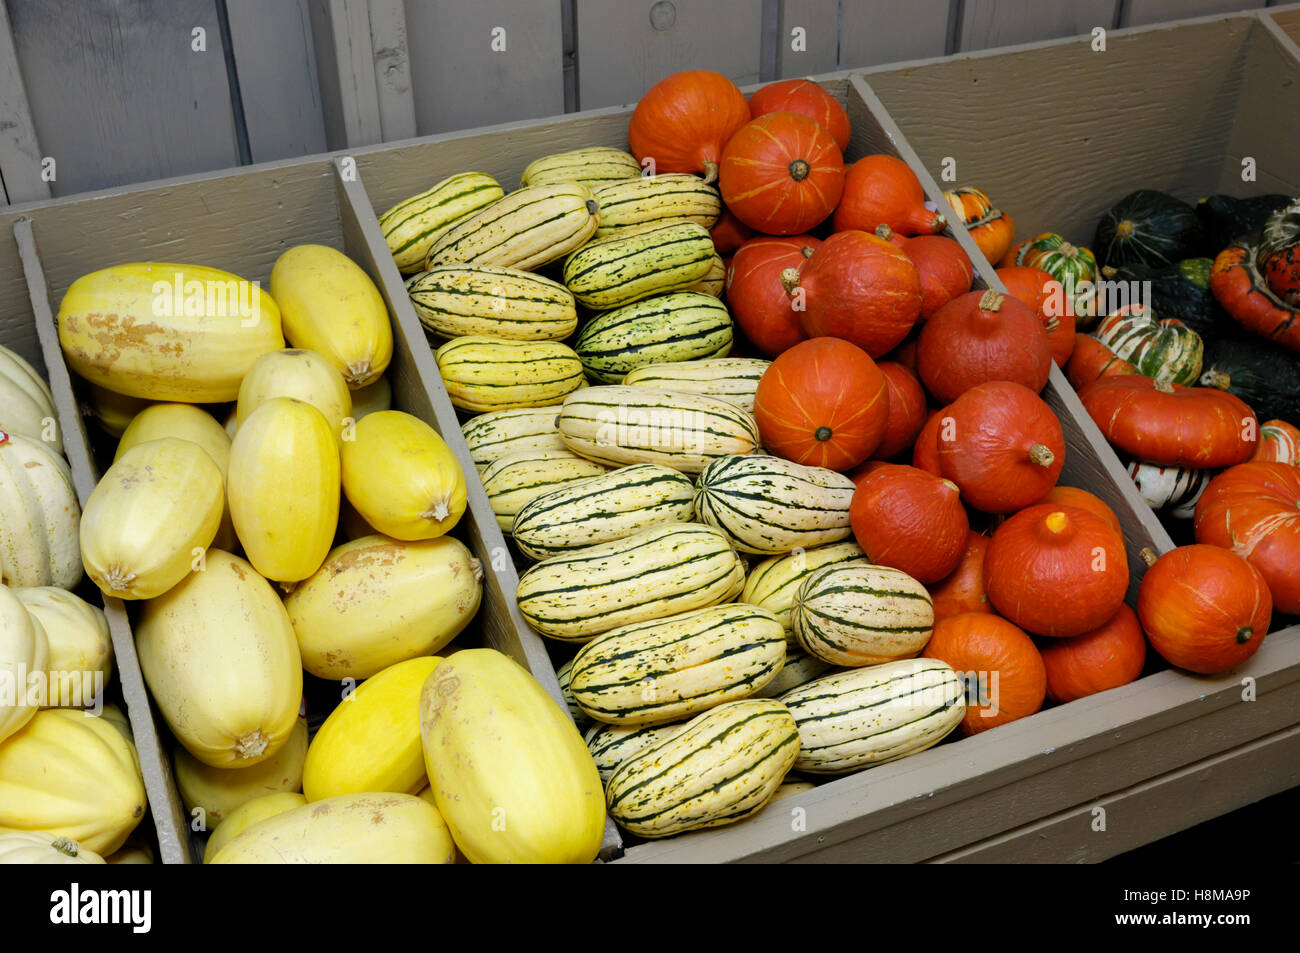 Different sorts of squash on farm market stall, Red Kuri, Sweet Potato squash, Spaghetti squash, Turban squash, Stock Photo